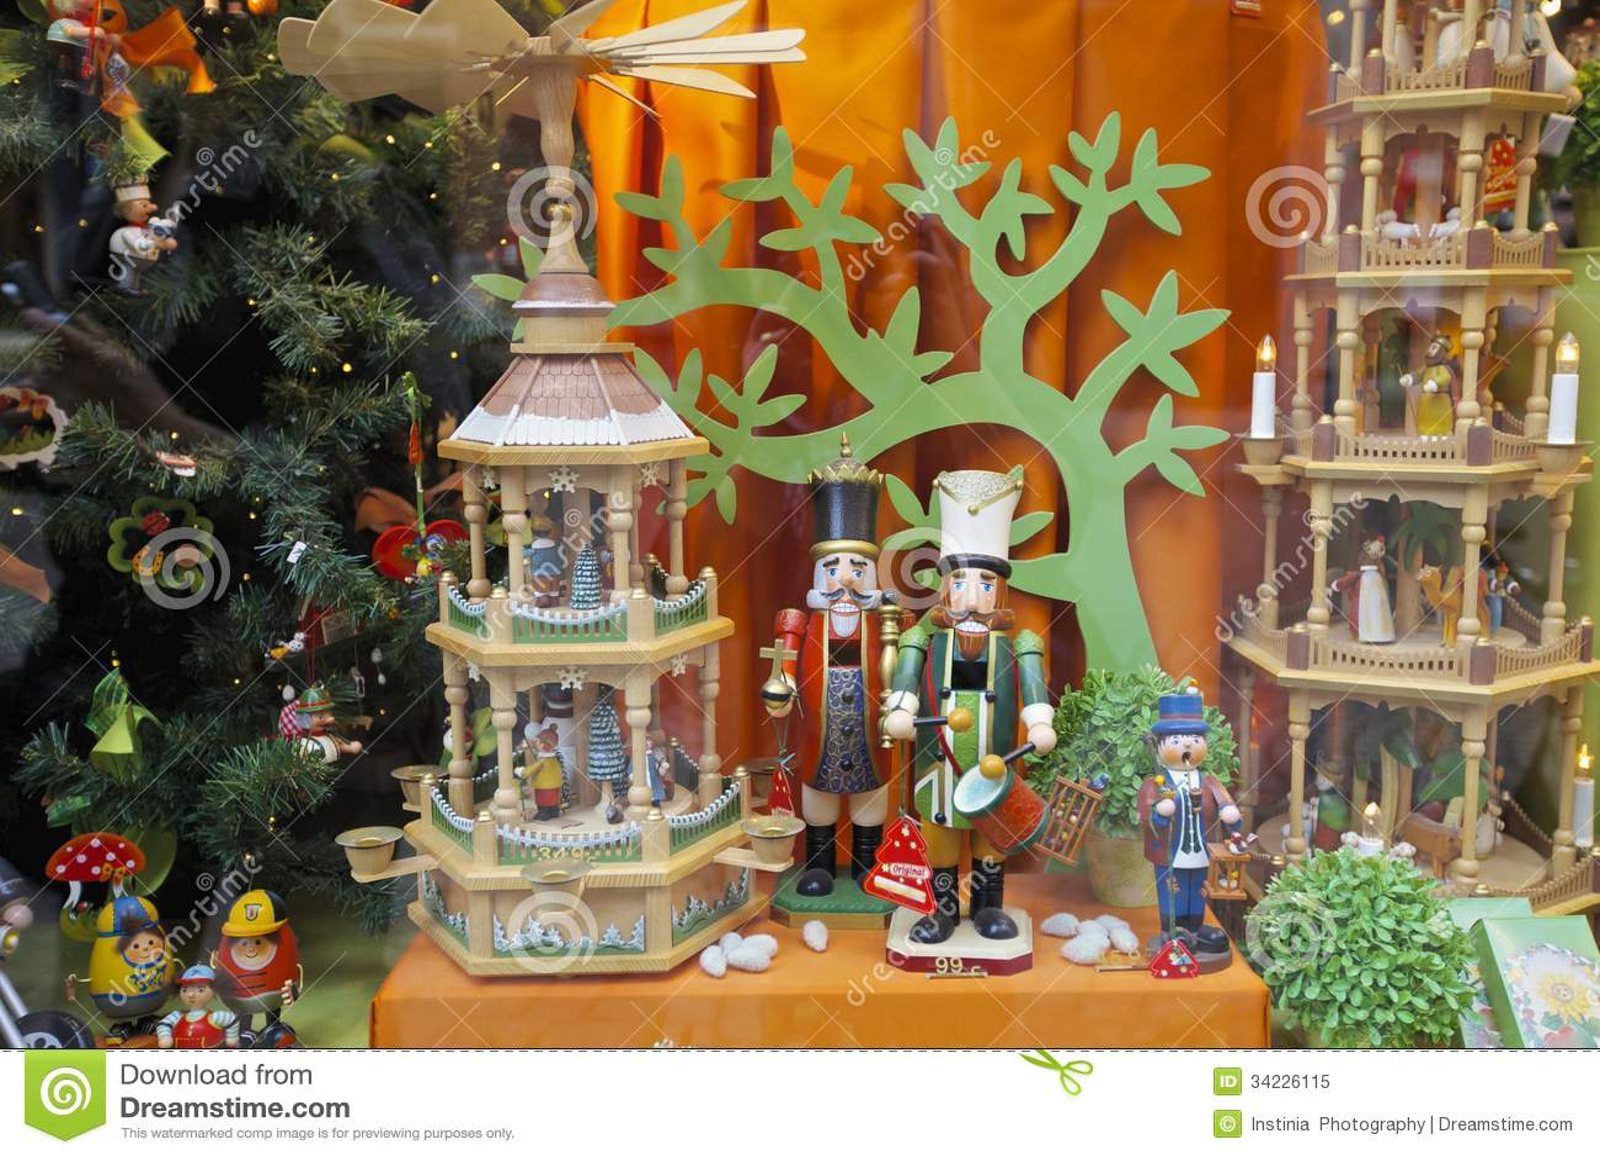 Christmas decoration ideas for windows - Belgium Christmas Decorations Shop Window Wooden Santa Gift Germany